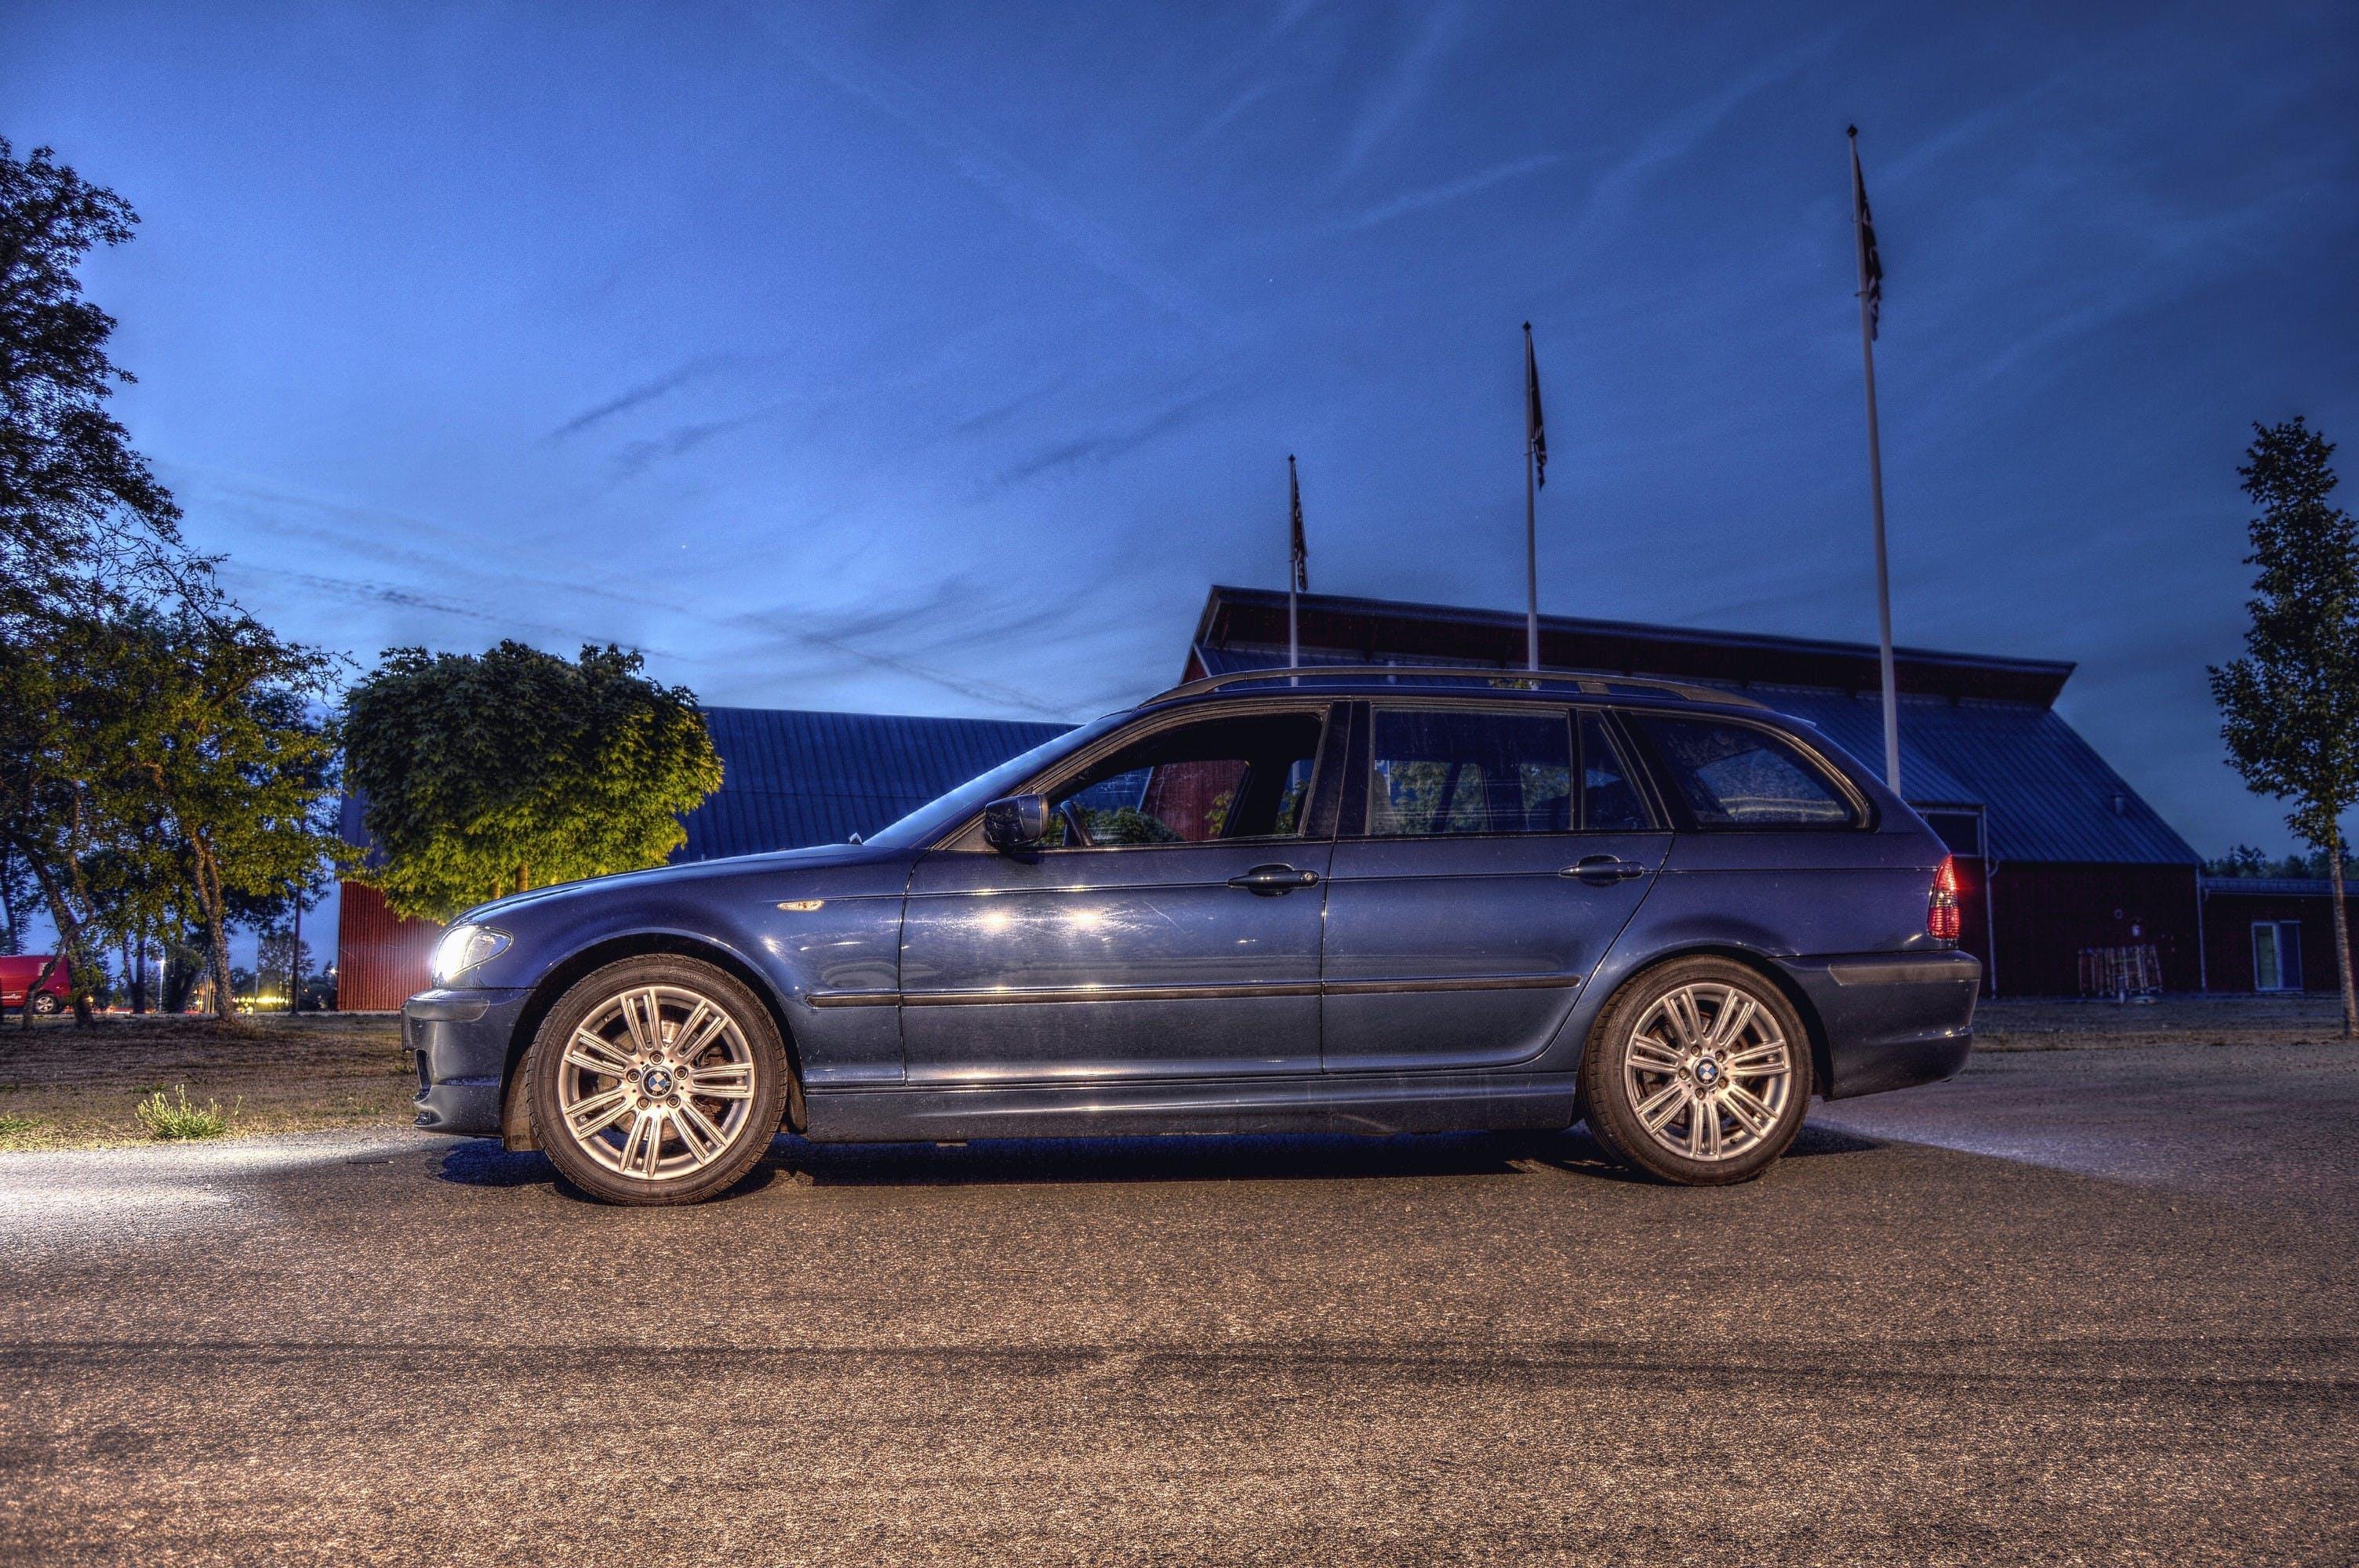 Free stock photo of lights, night, blue, car